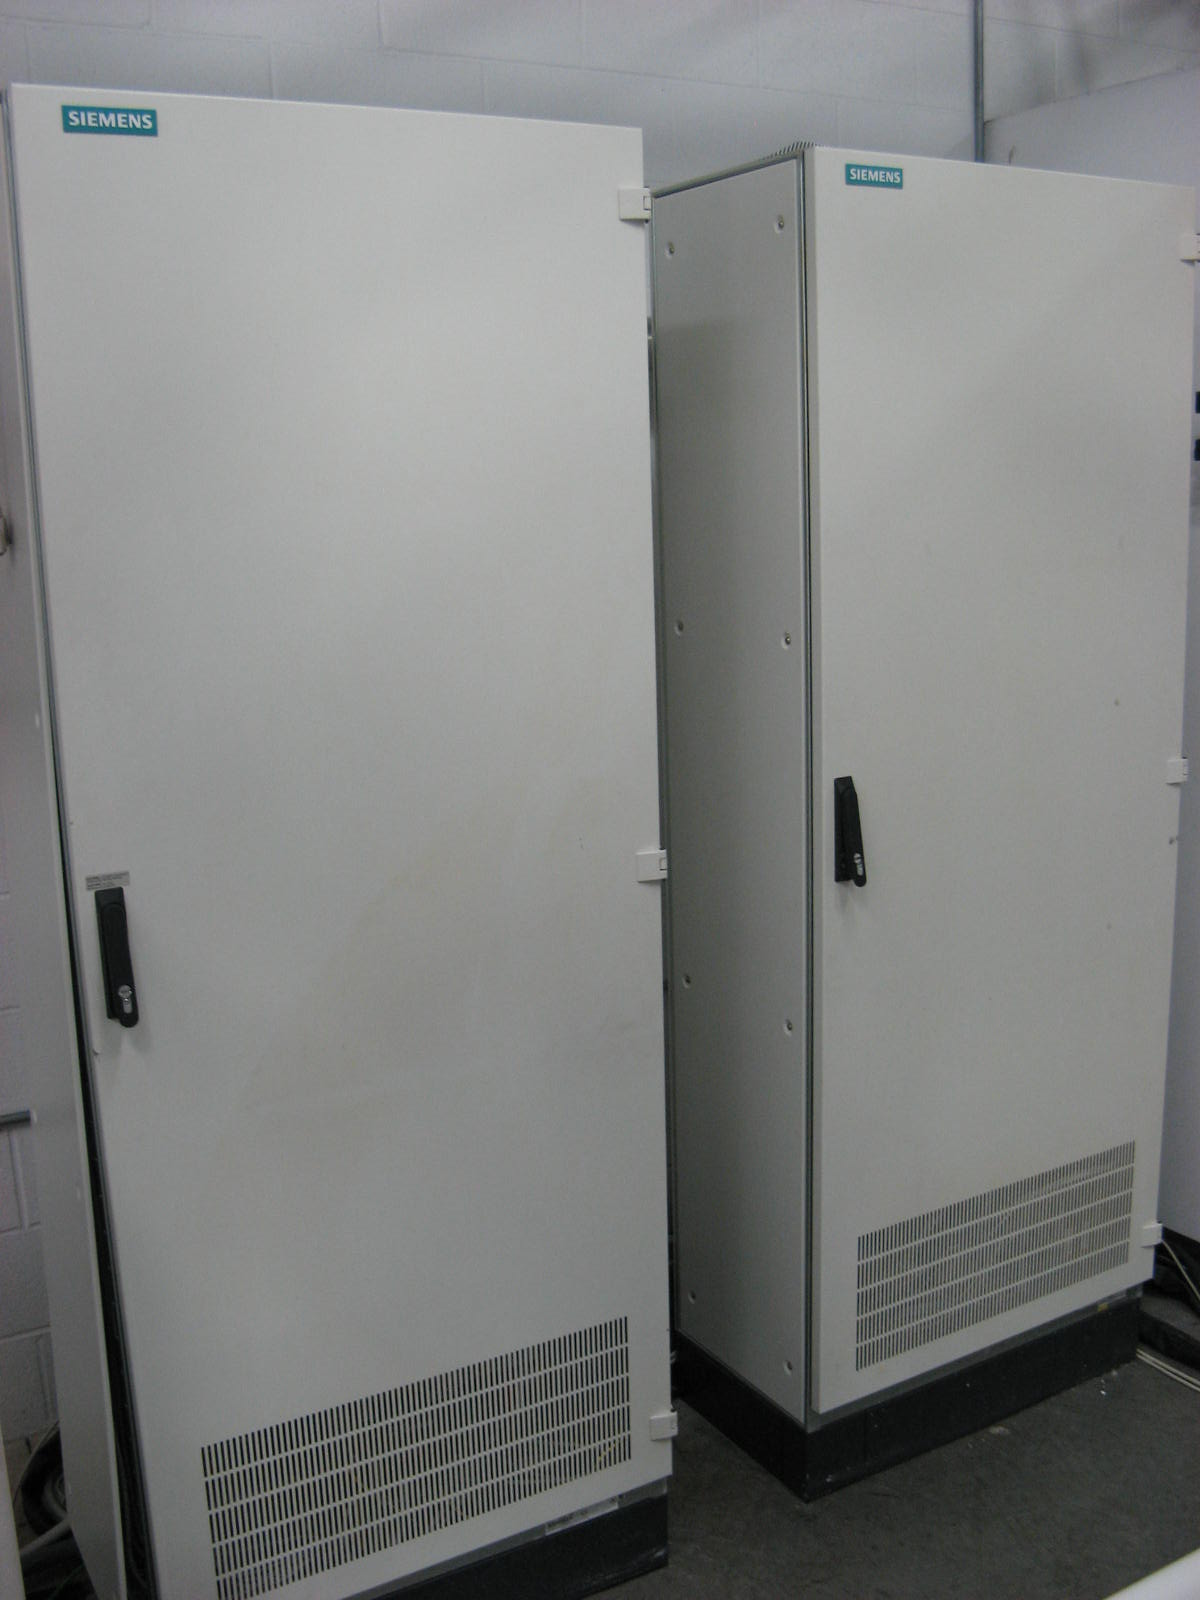 Siemens Iconos R200 Radiographic Room Rsti Exchange